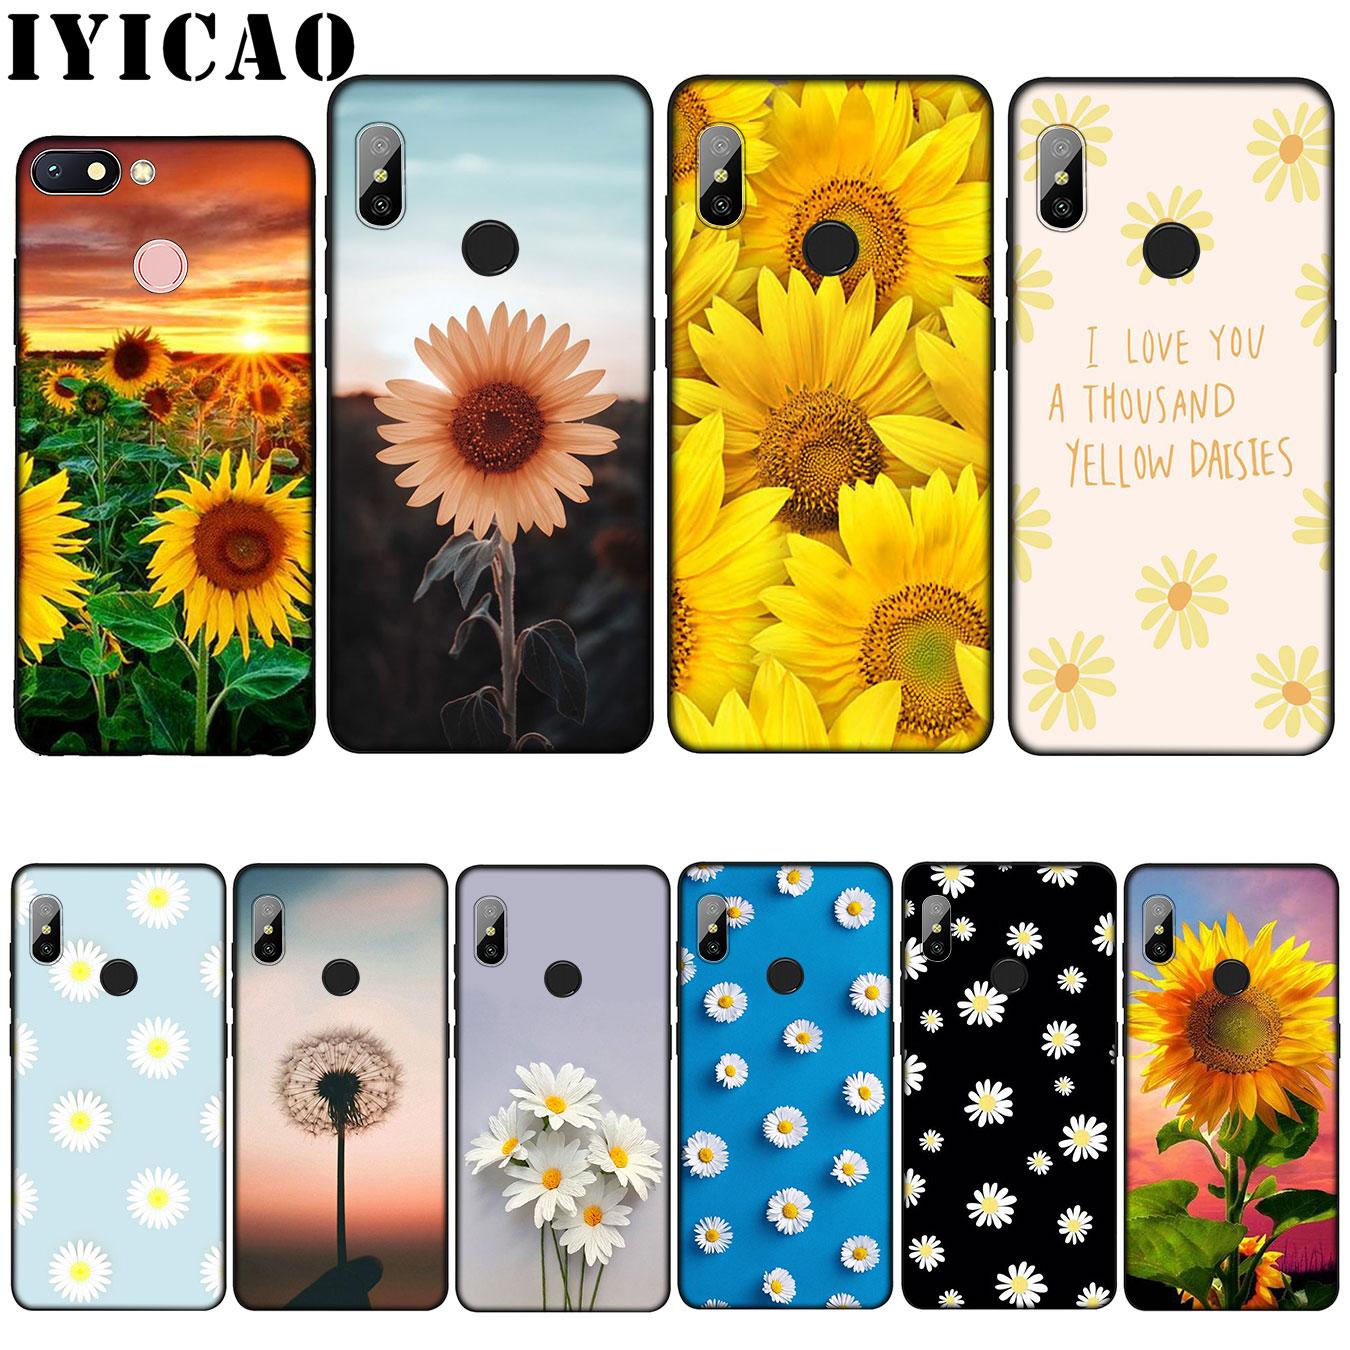 IYICAO flor amarilla pequeña Margarita girasol funda de silicona suave para Xiaomi mi 9 8 A2 Lite A1 6 pocofone f1 MAX 3 mi 9 mi 8 mi a2